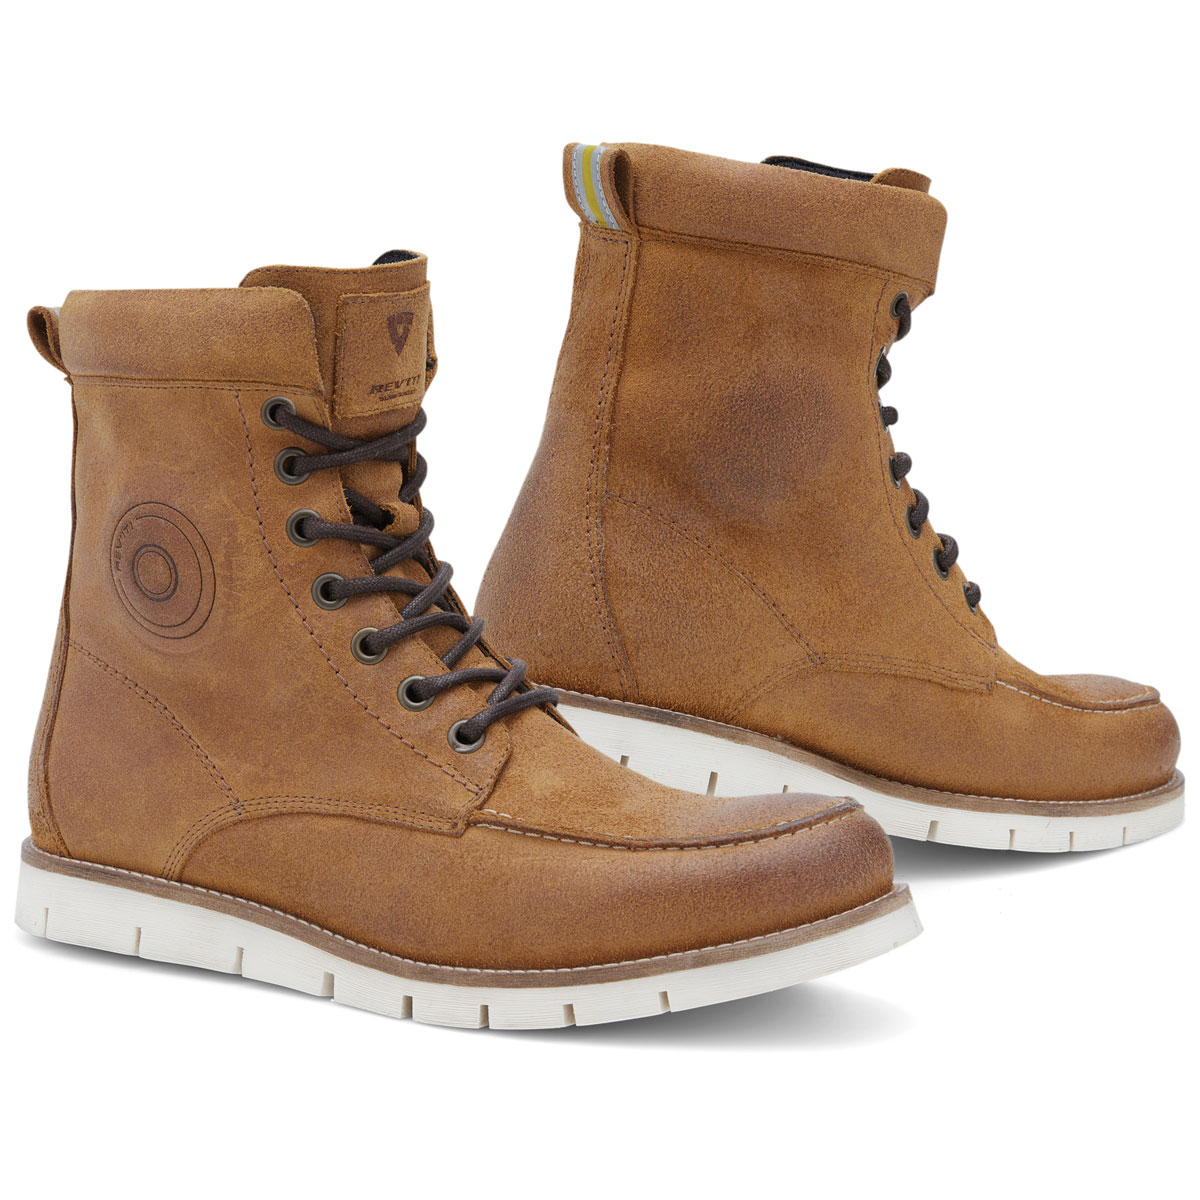 REV′IT! Men's Yukon Sand Boots